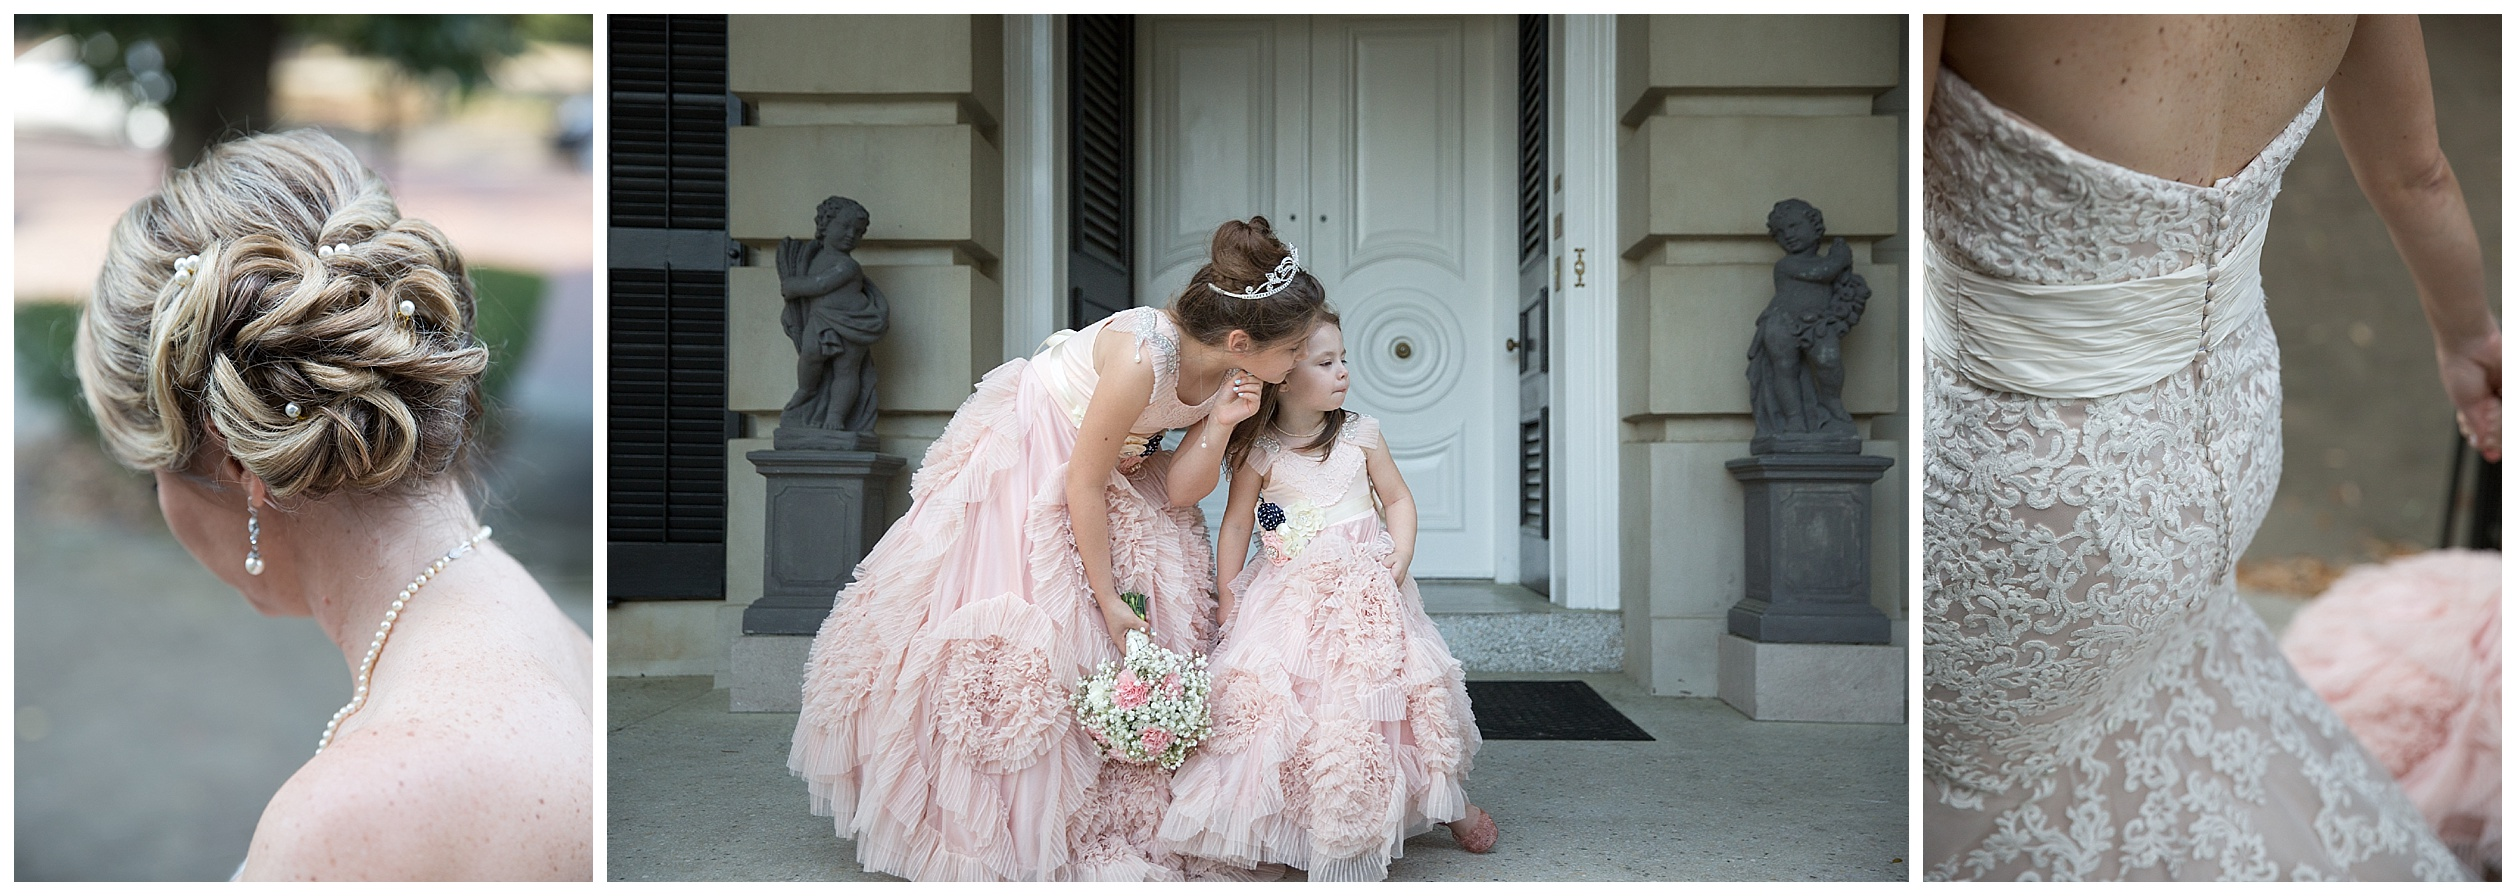 savannah ga wedding photography-43.jpg